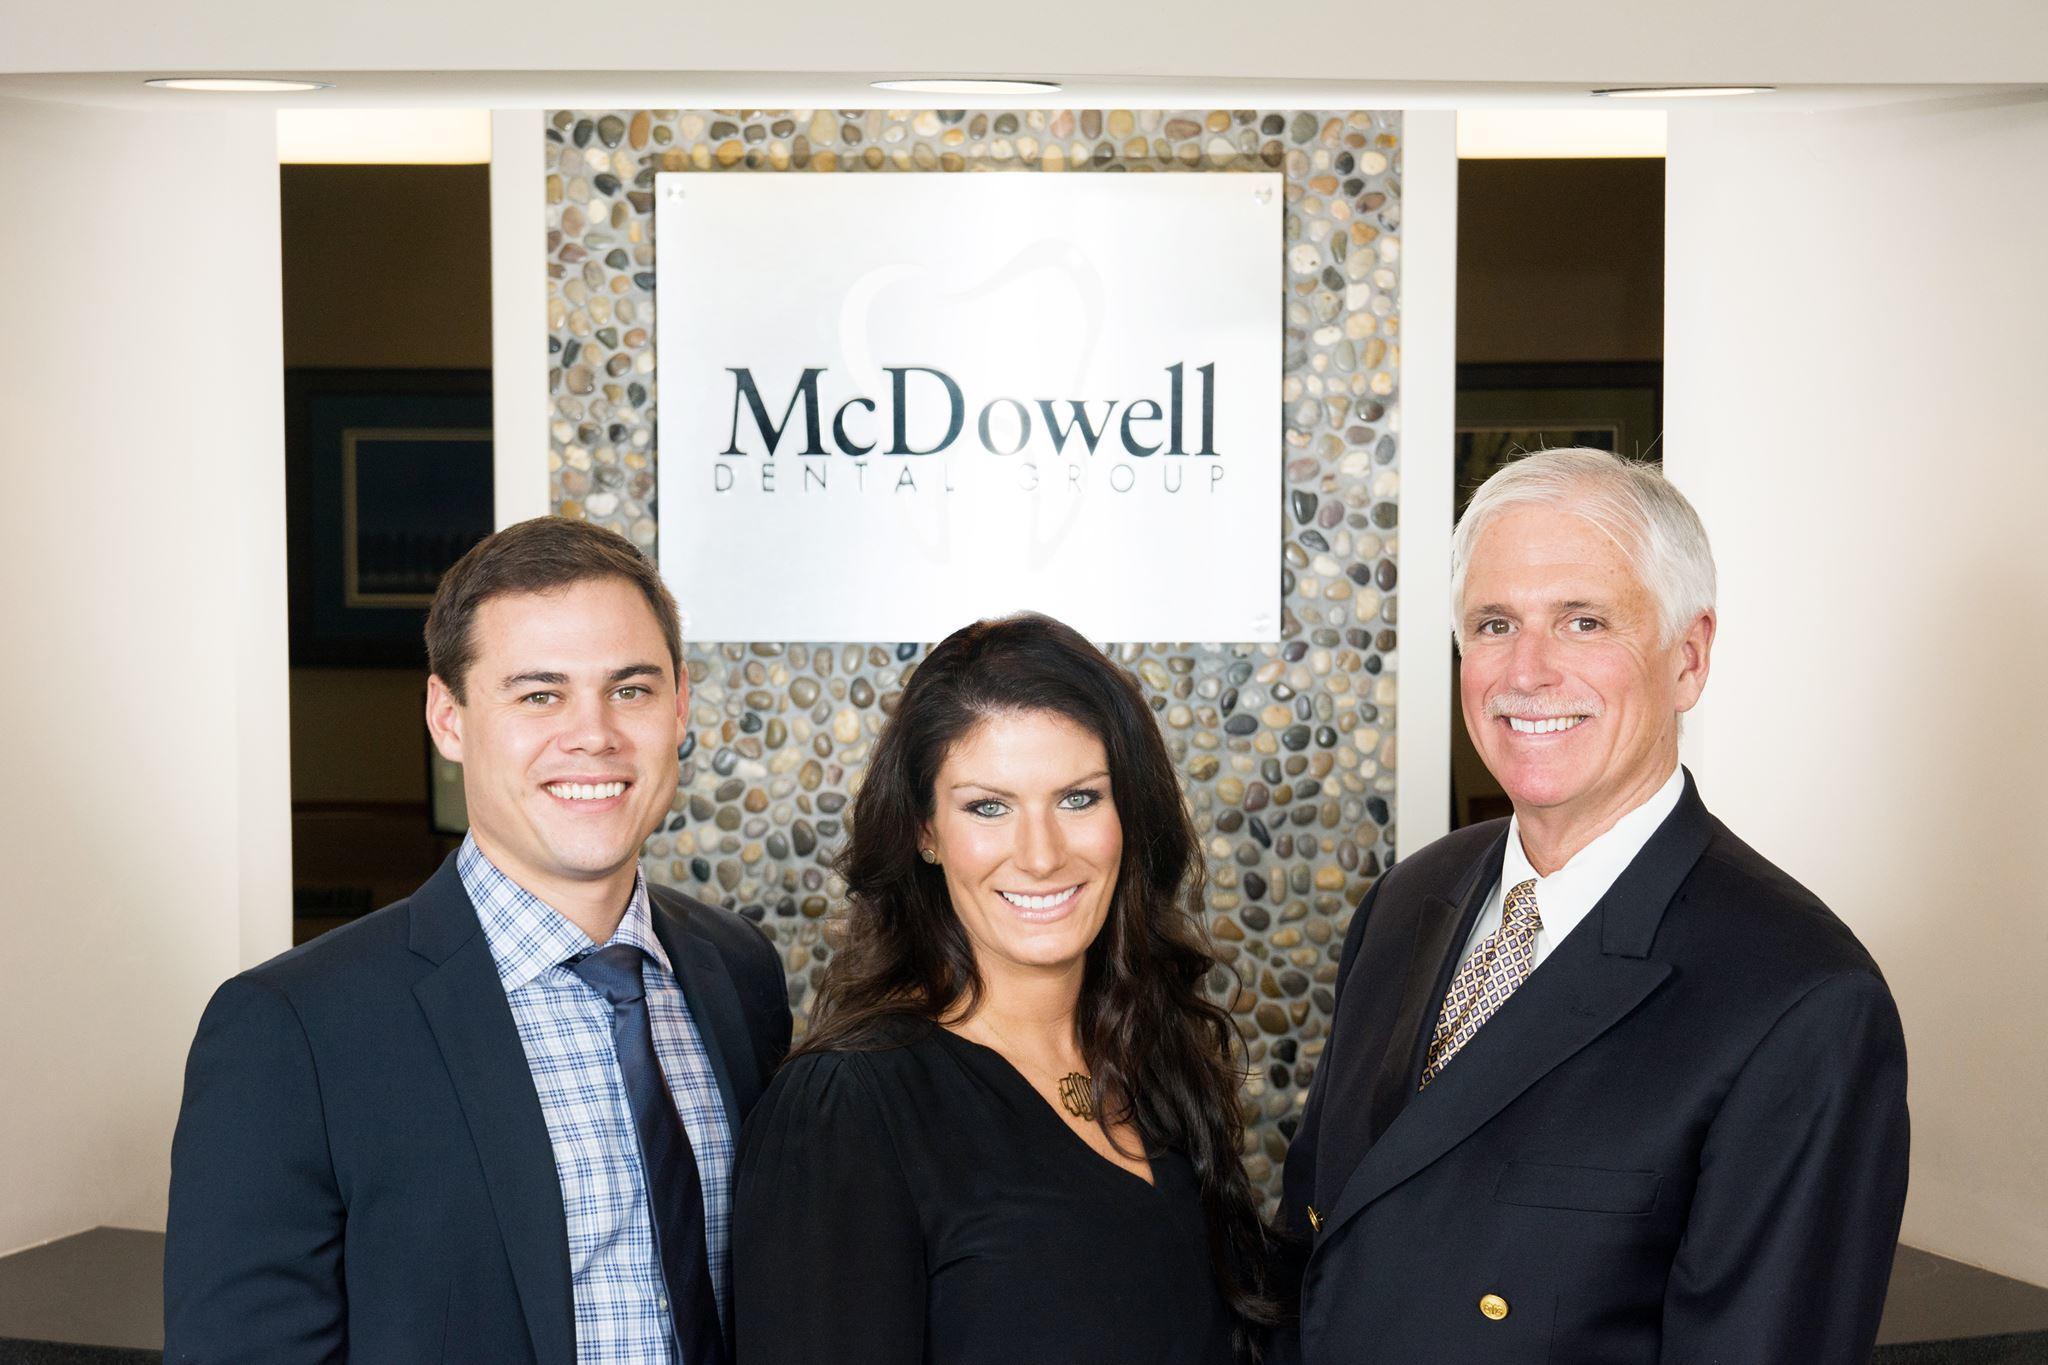 McDowell Dental Group image 3